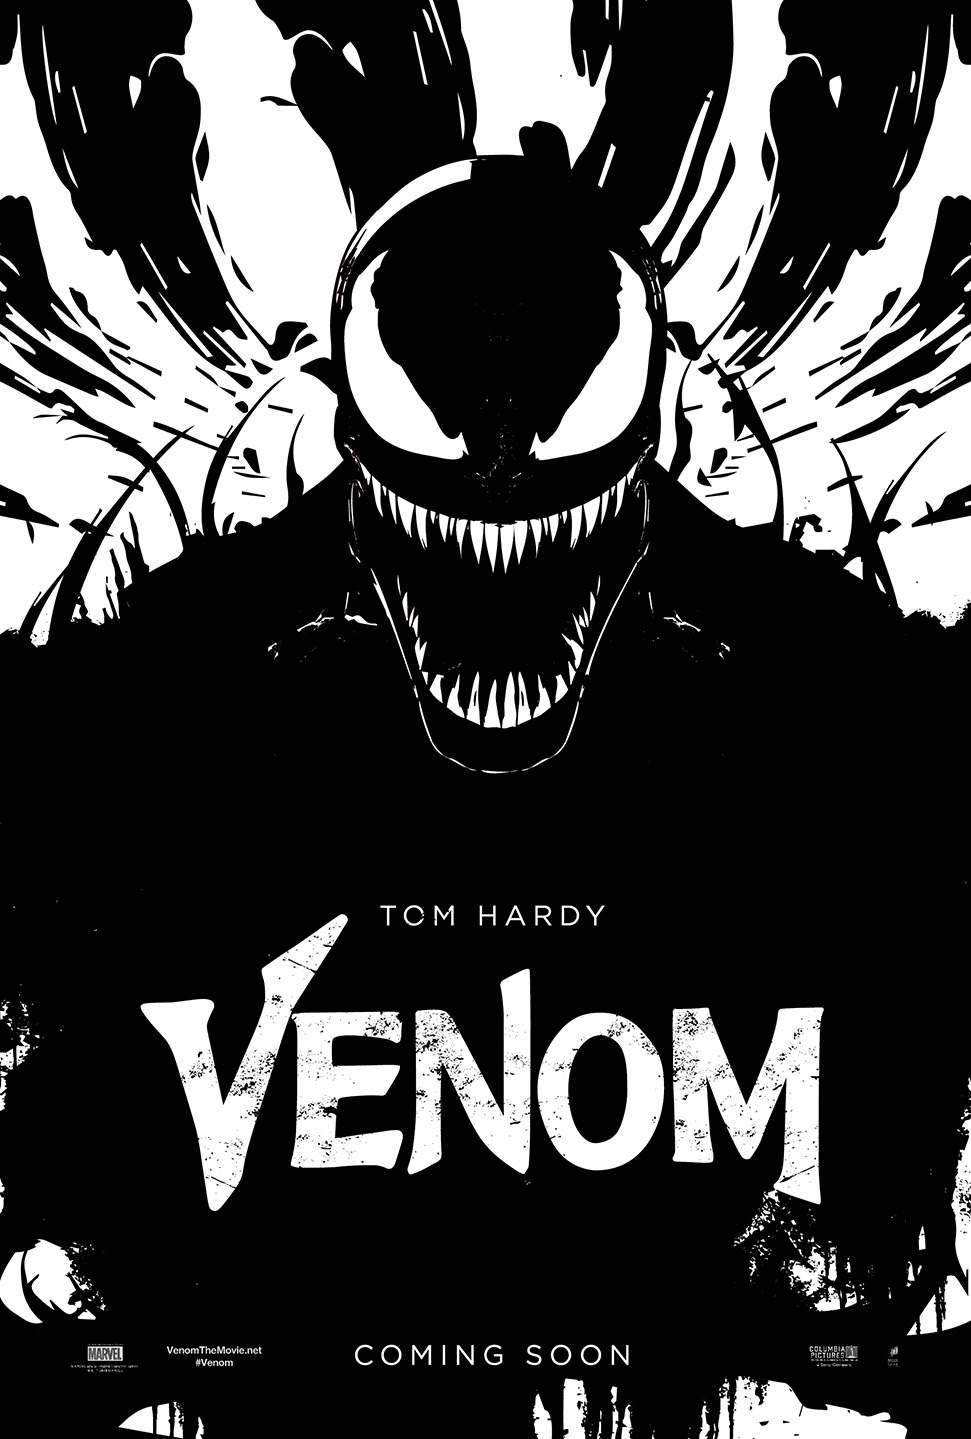 Venom 2018 - Alternative Movie Poster on Behance